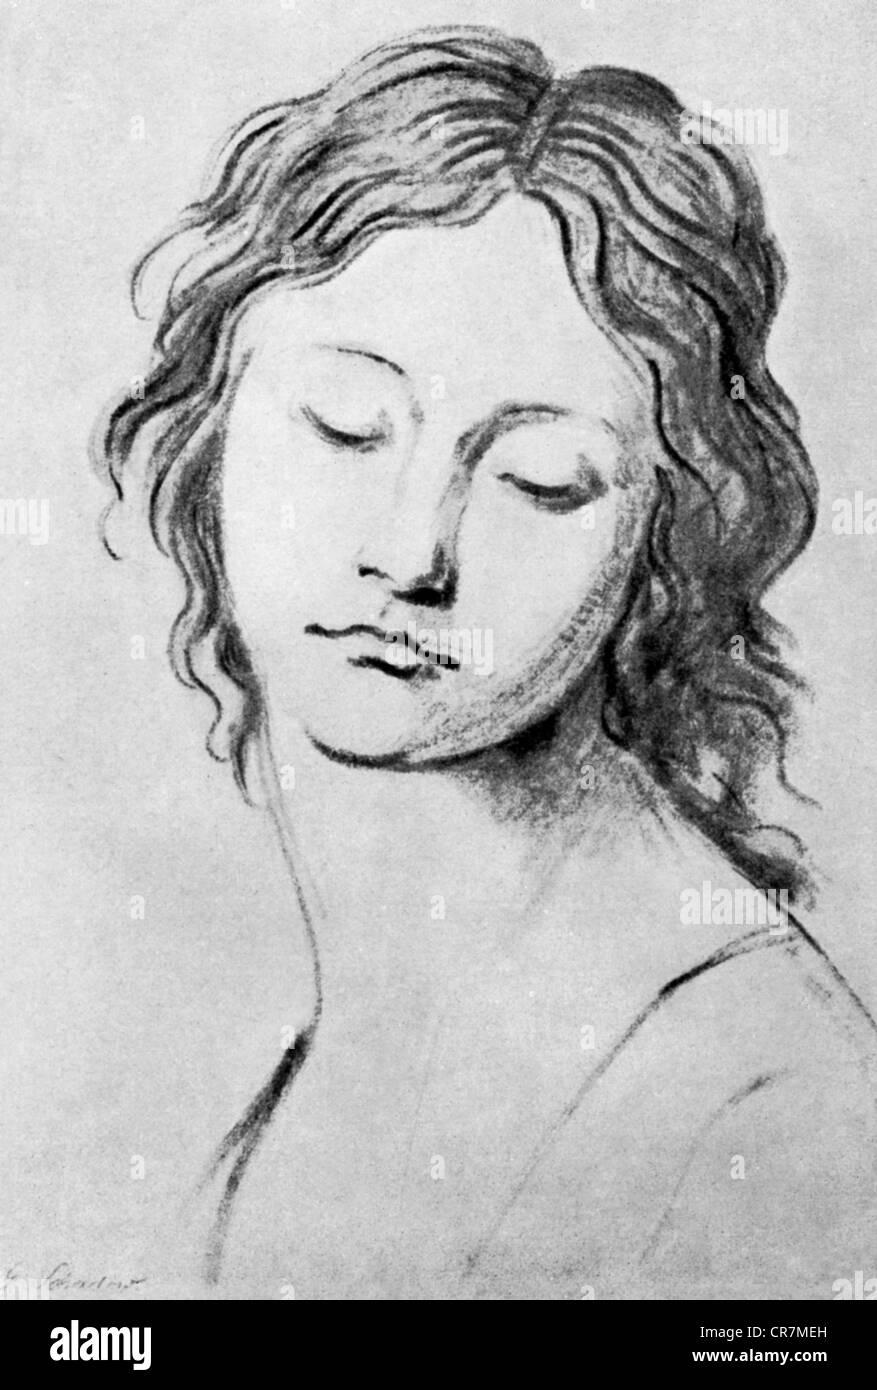 , Johann Gottfried Schadow, 20.5.1764 - 27.1.1850, escultor y artista gráfico alemán, obras, retrato de Imagen De Stock